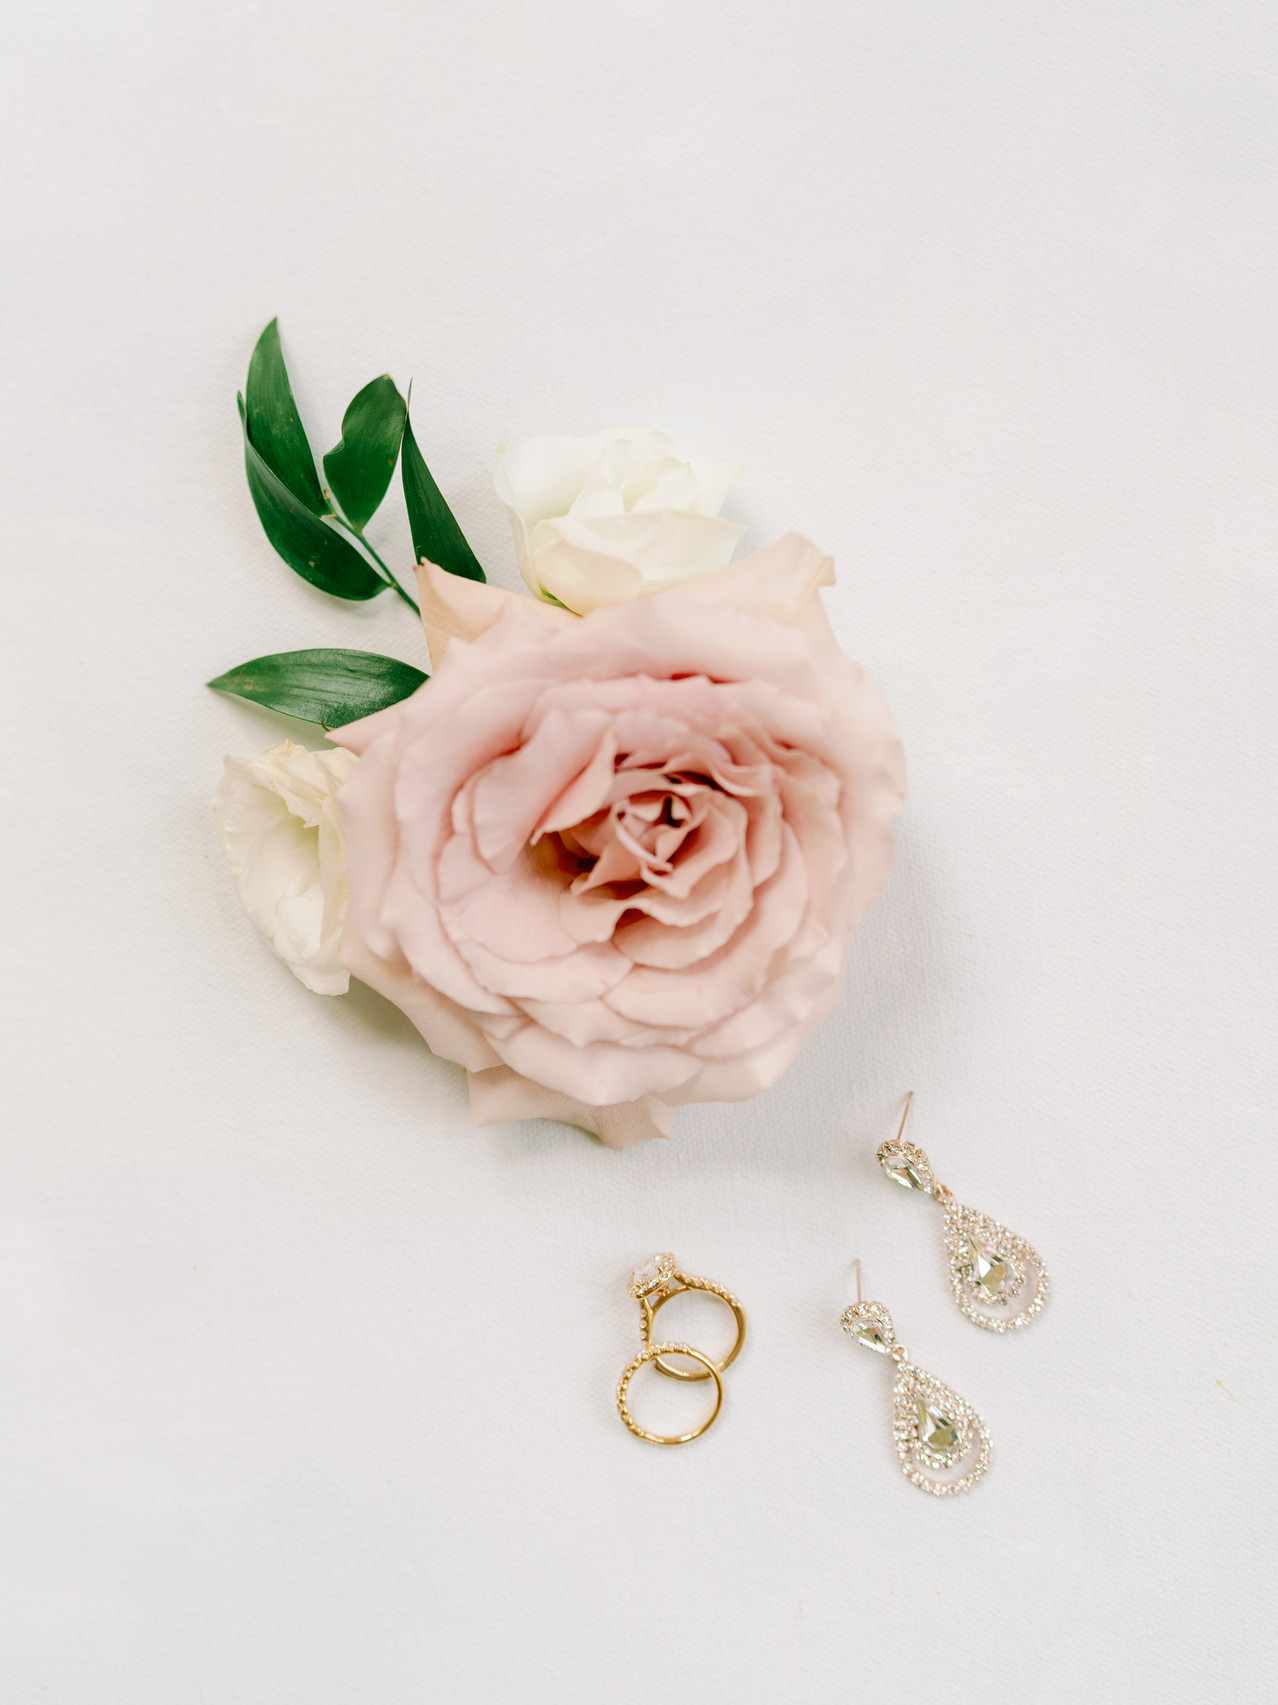 SoHo Event Design wedding planner Duke Mansion wedding bride custom jewelry north carolina wedding planner